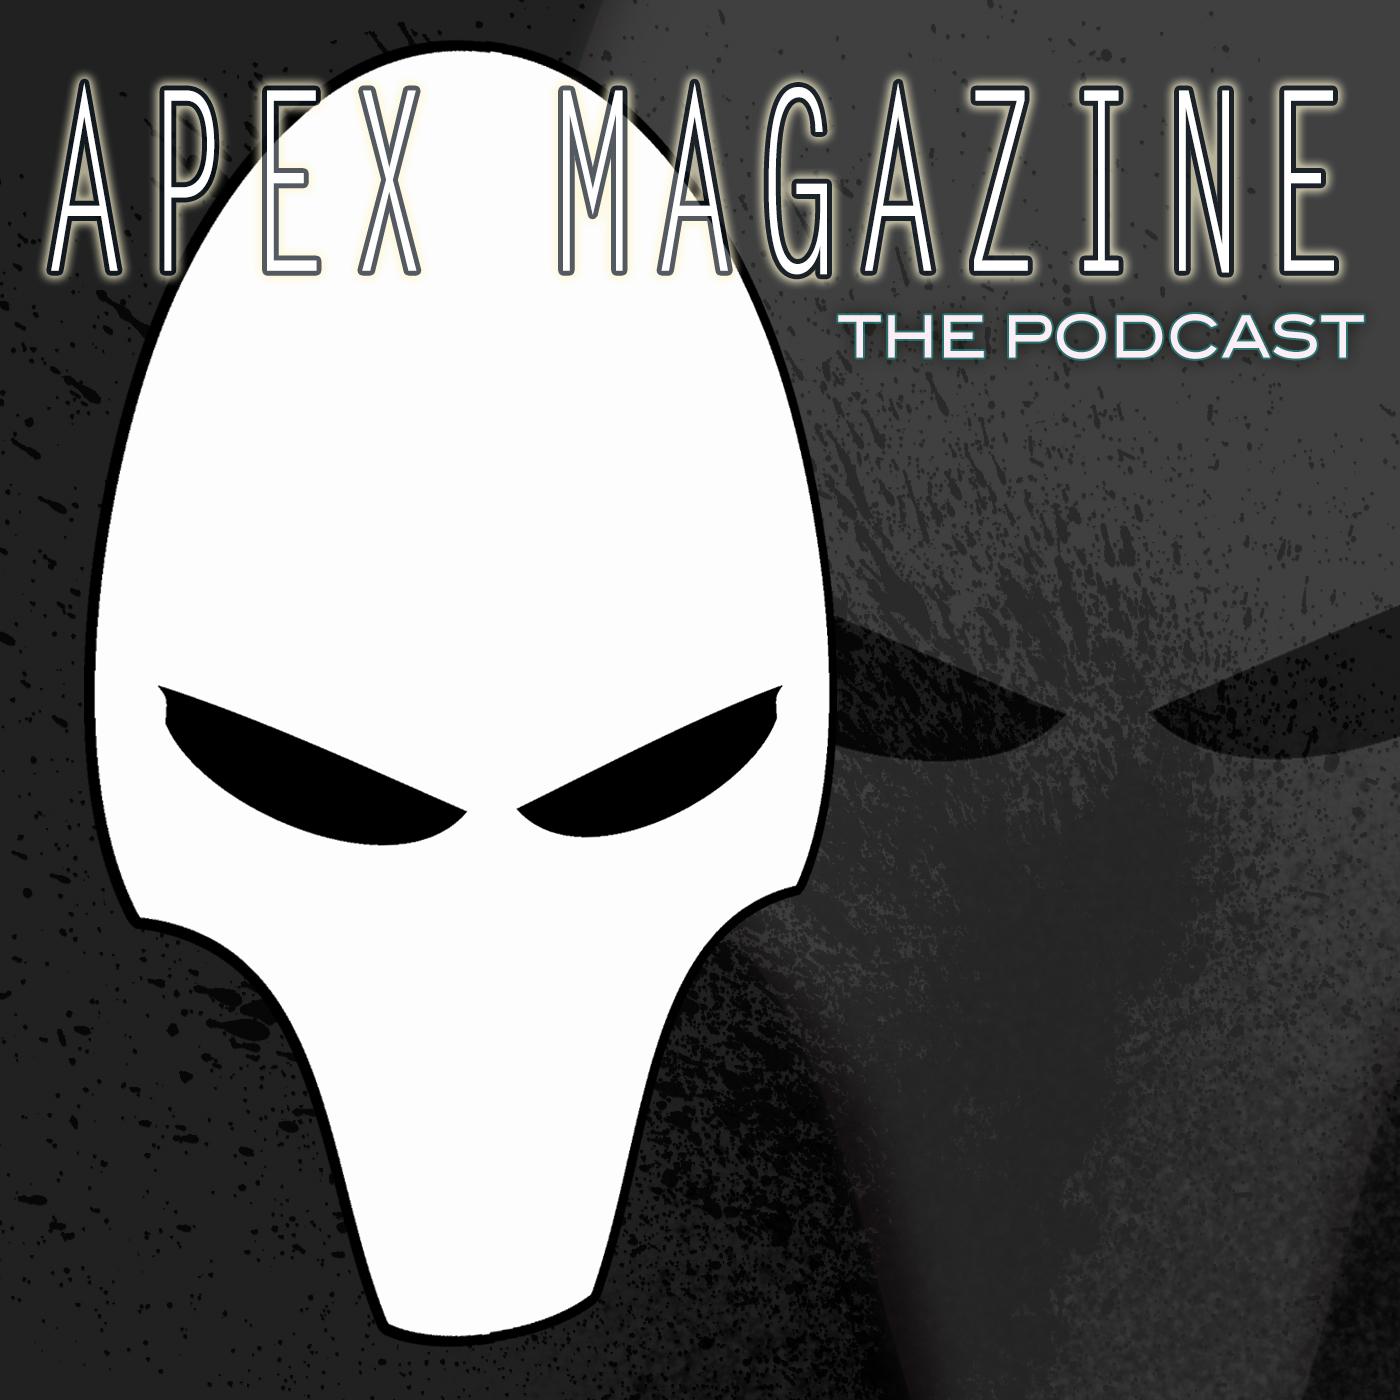 Apex Magazine Podcast logo